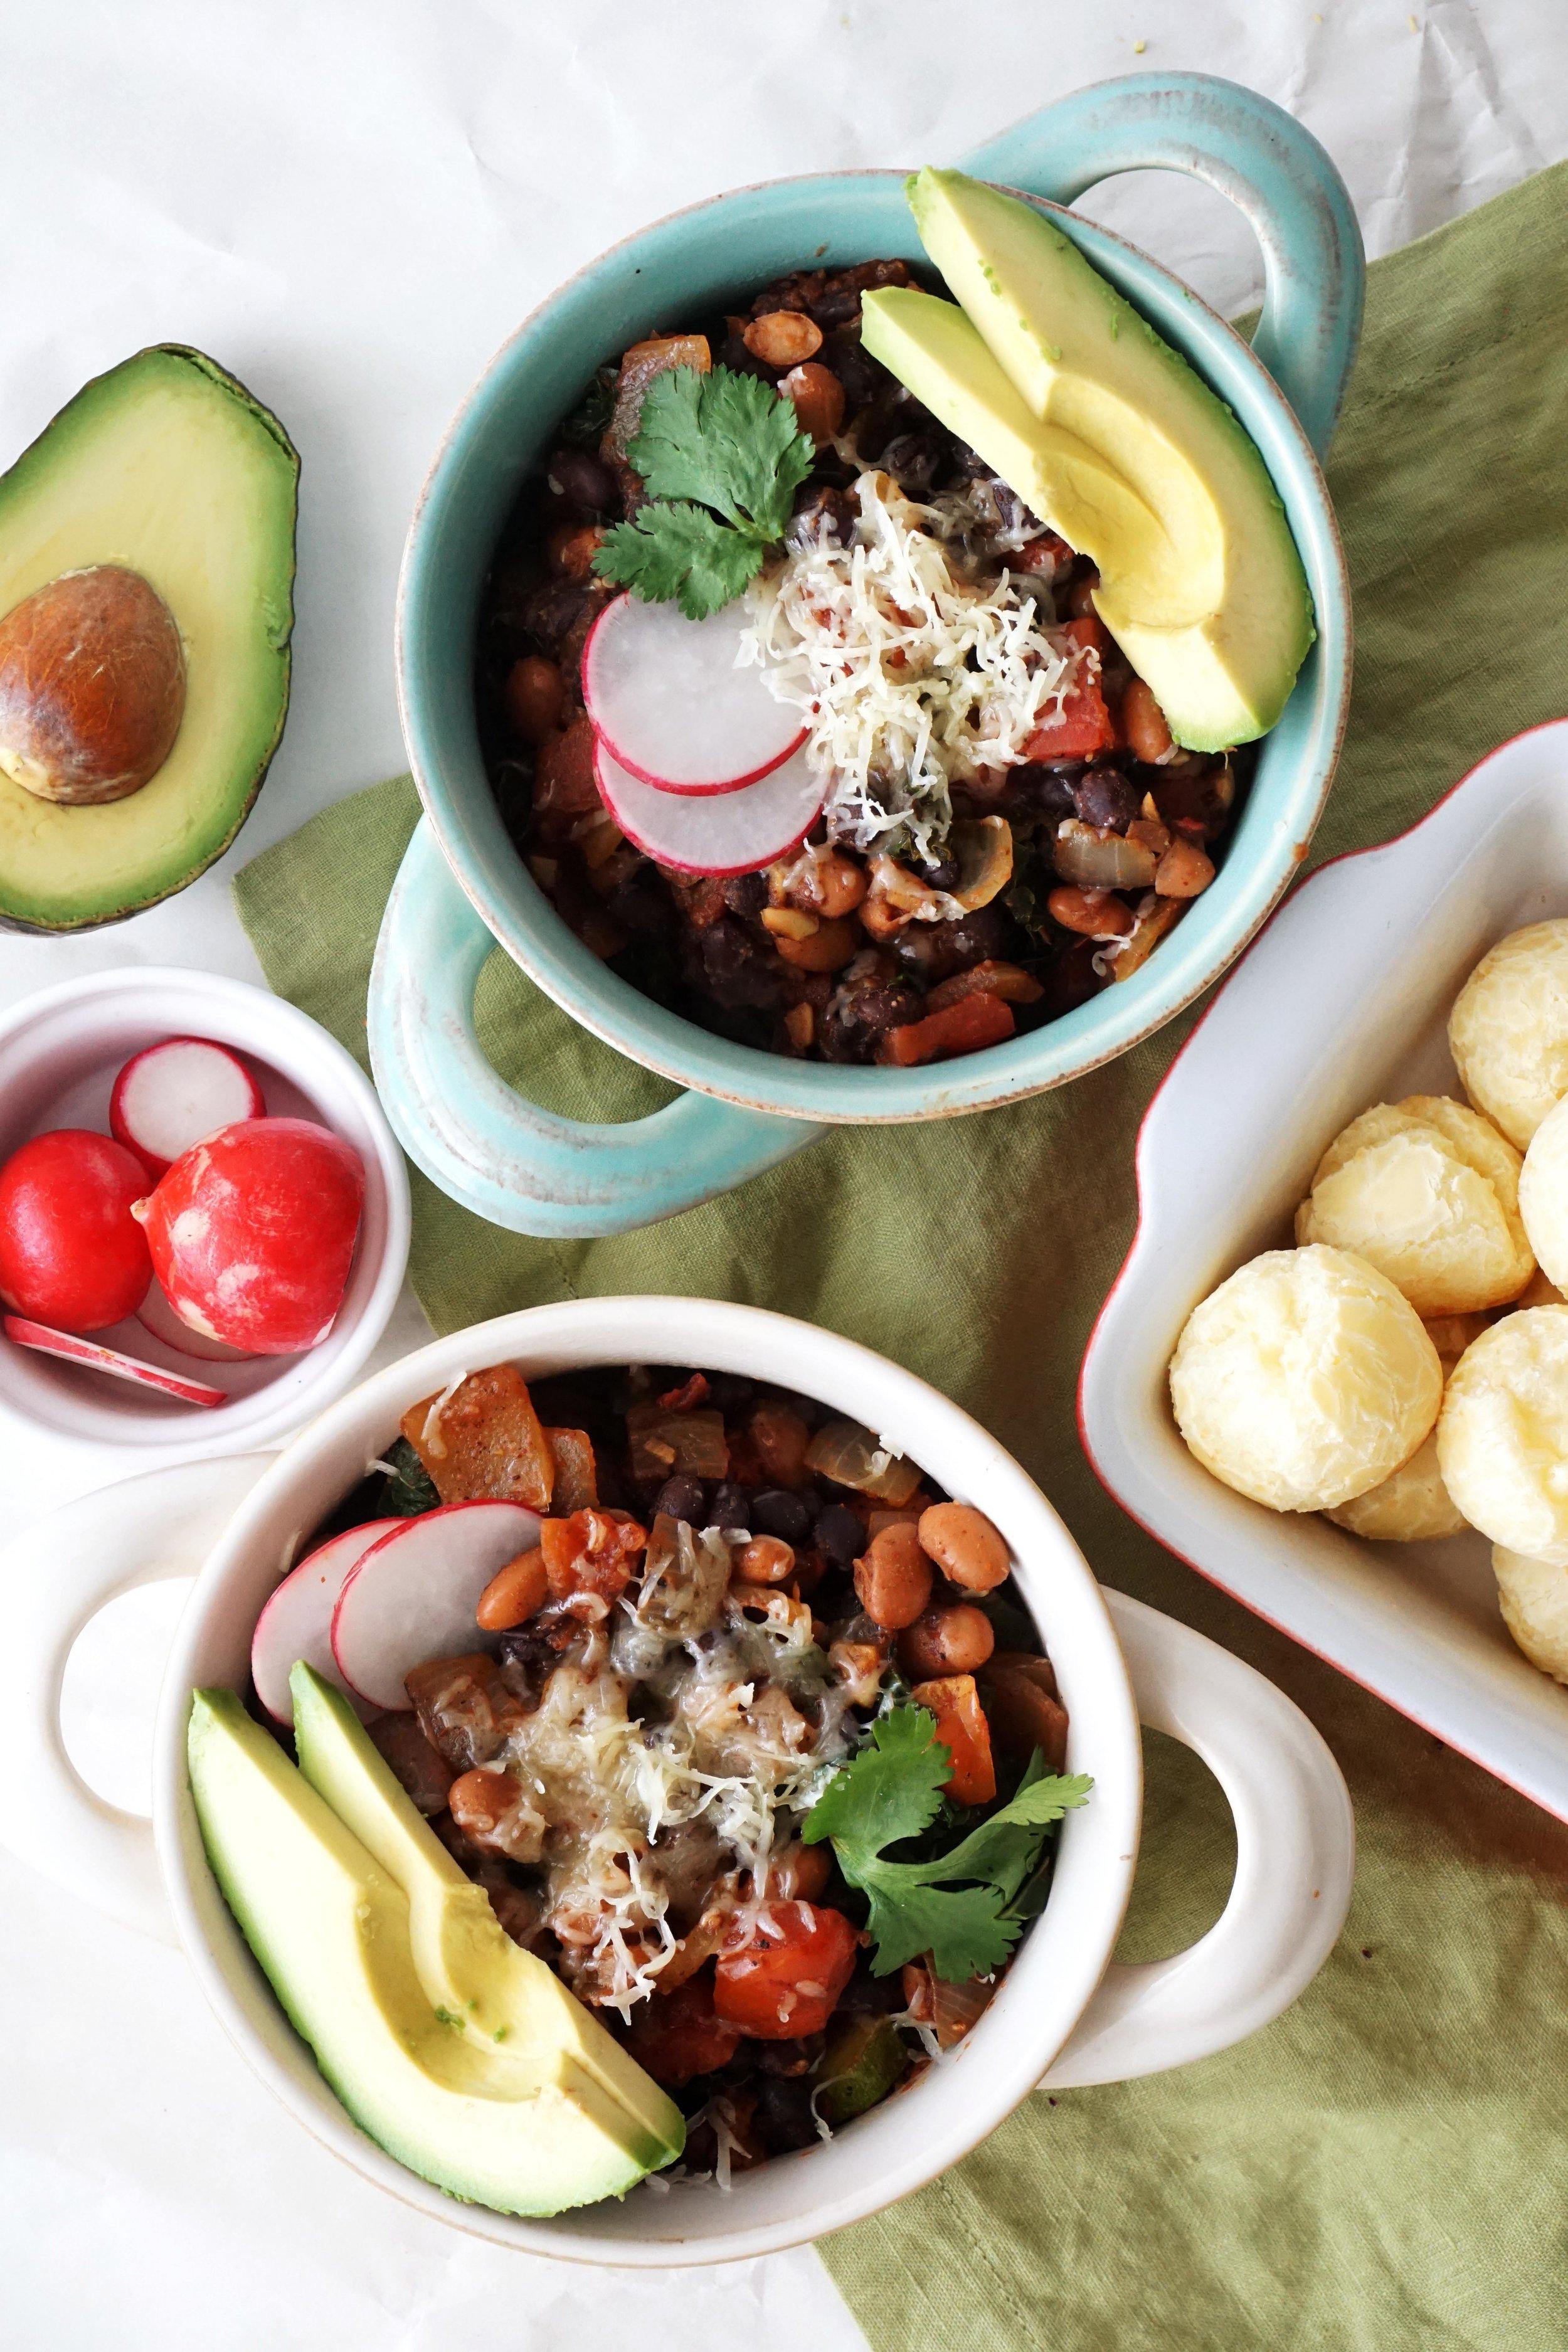 Veggie Chili Super Bowls with Cheddar-Parmesan Bites (GF)